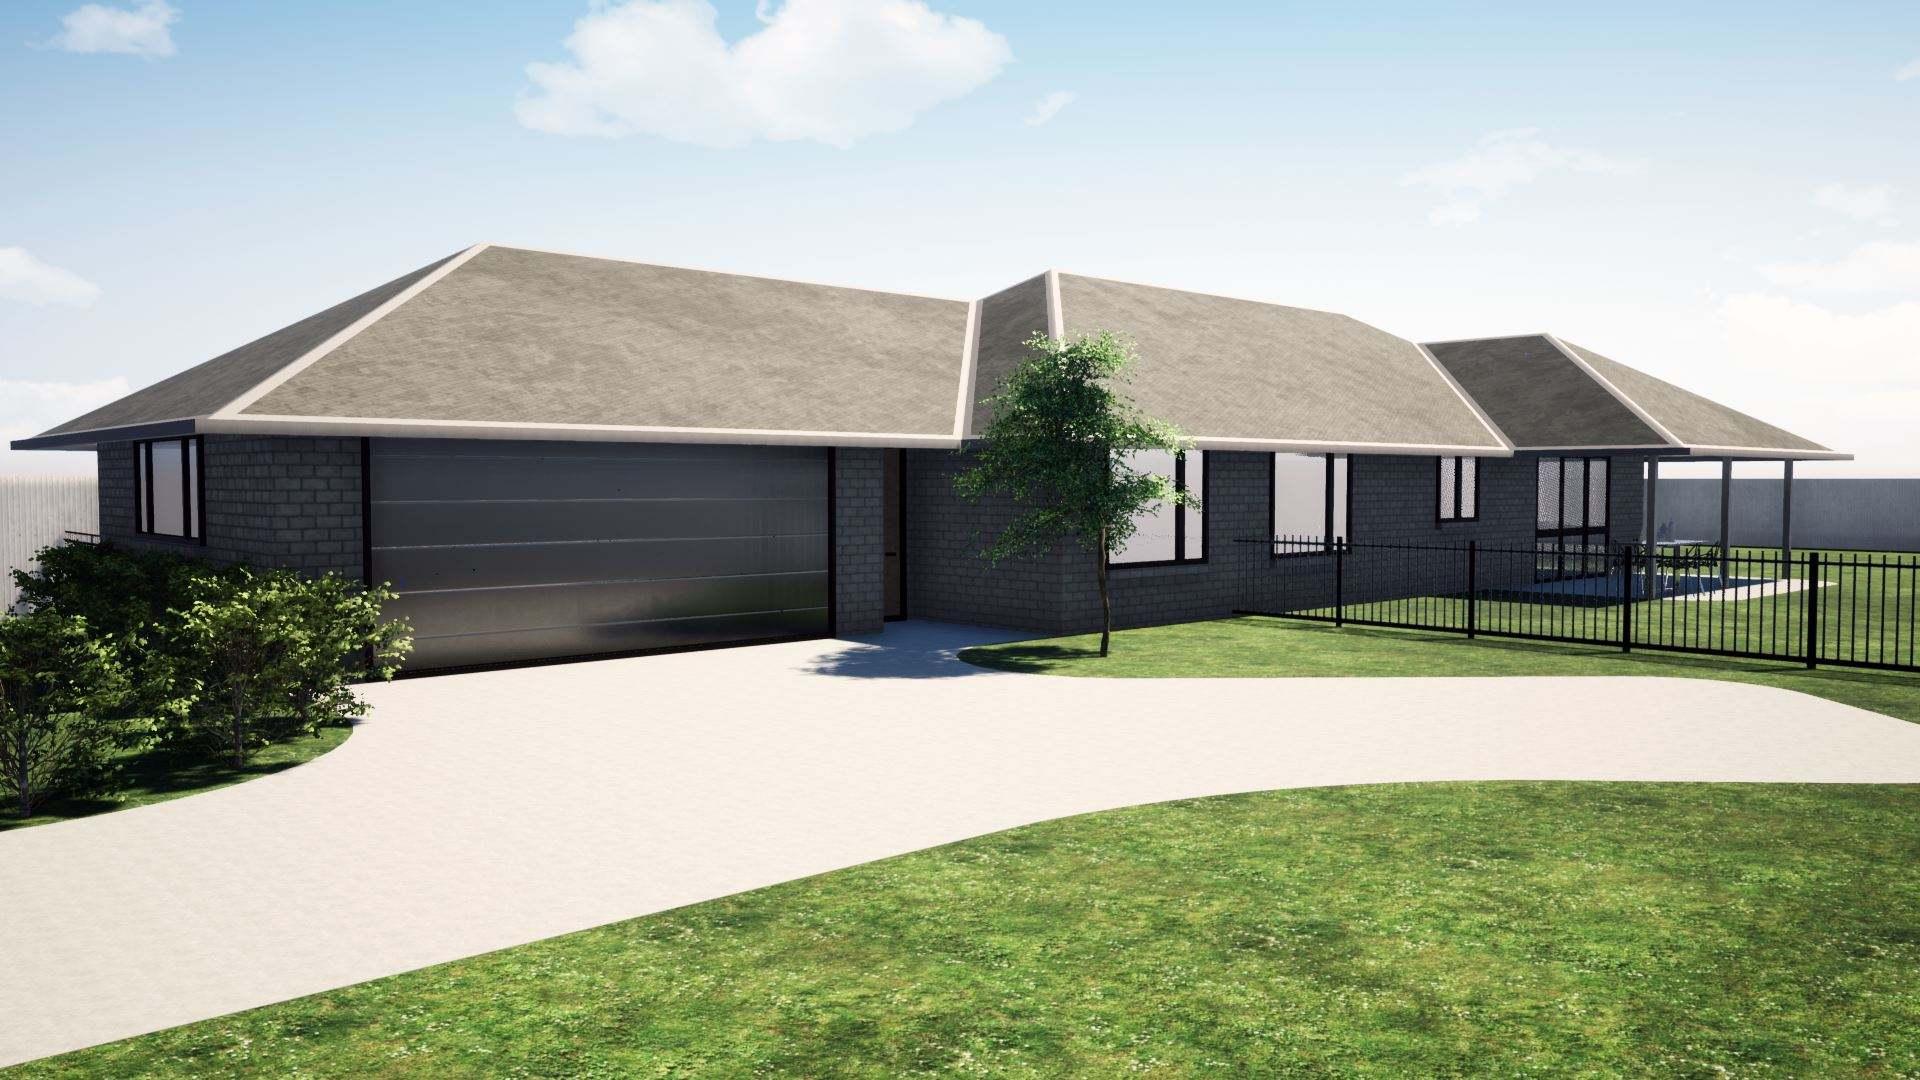 Waipukurau and Surrounds 3房 Family friendly New Builds!